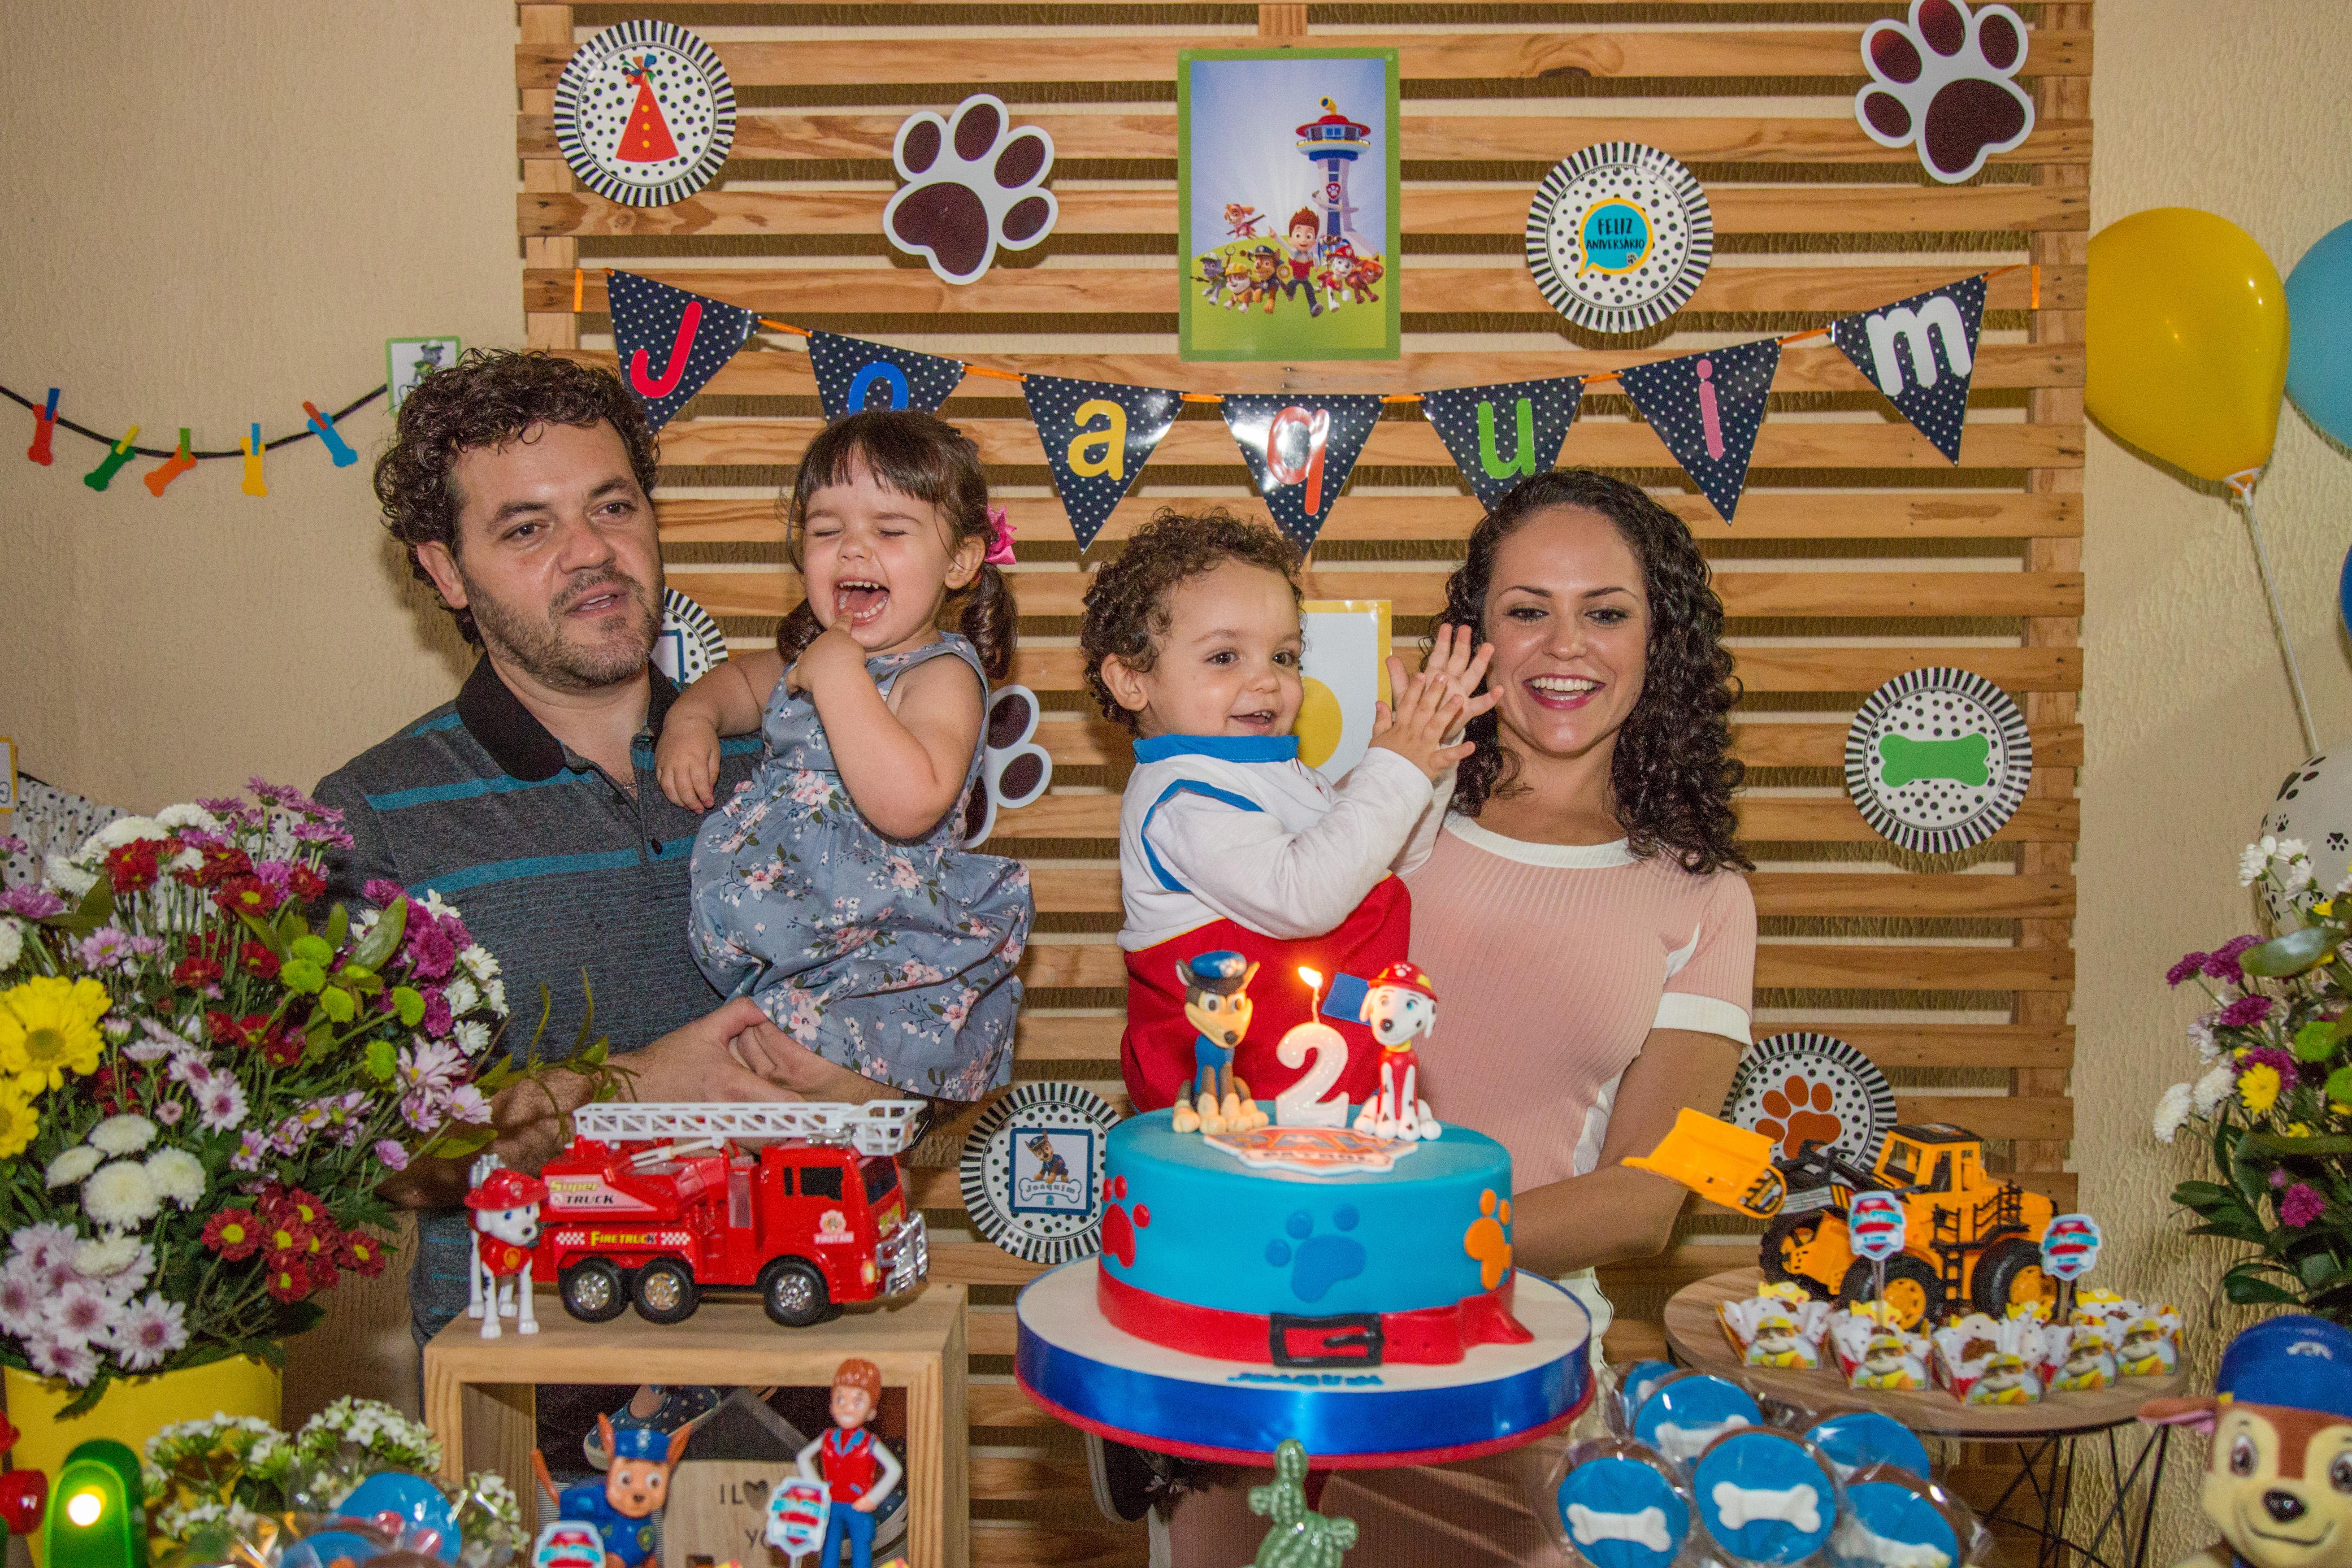 Festa‐Infantil‐Florianopolis‐Ana‐Marmo‐FotografiaFesta‐Infantil‐Florianopolis‐Ana‐Marmo‐Fotografia191A0788